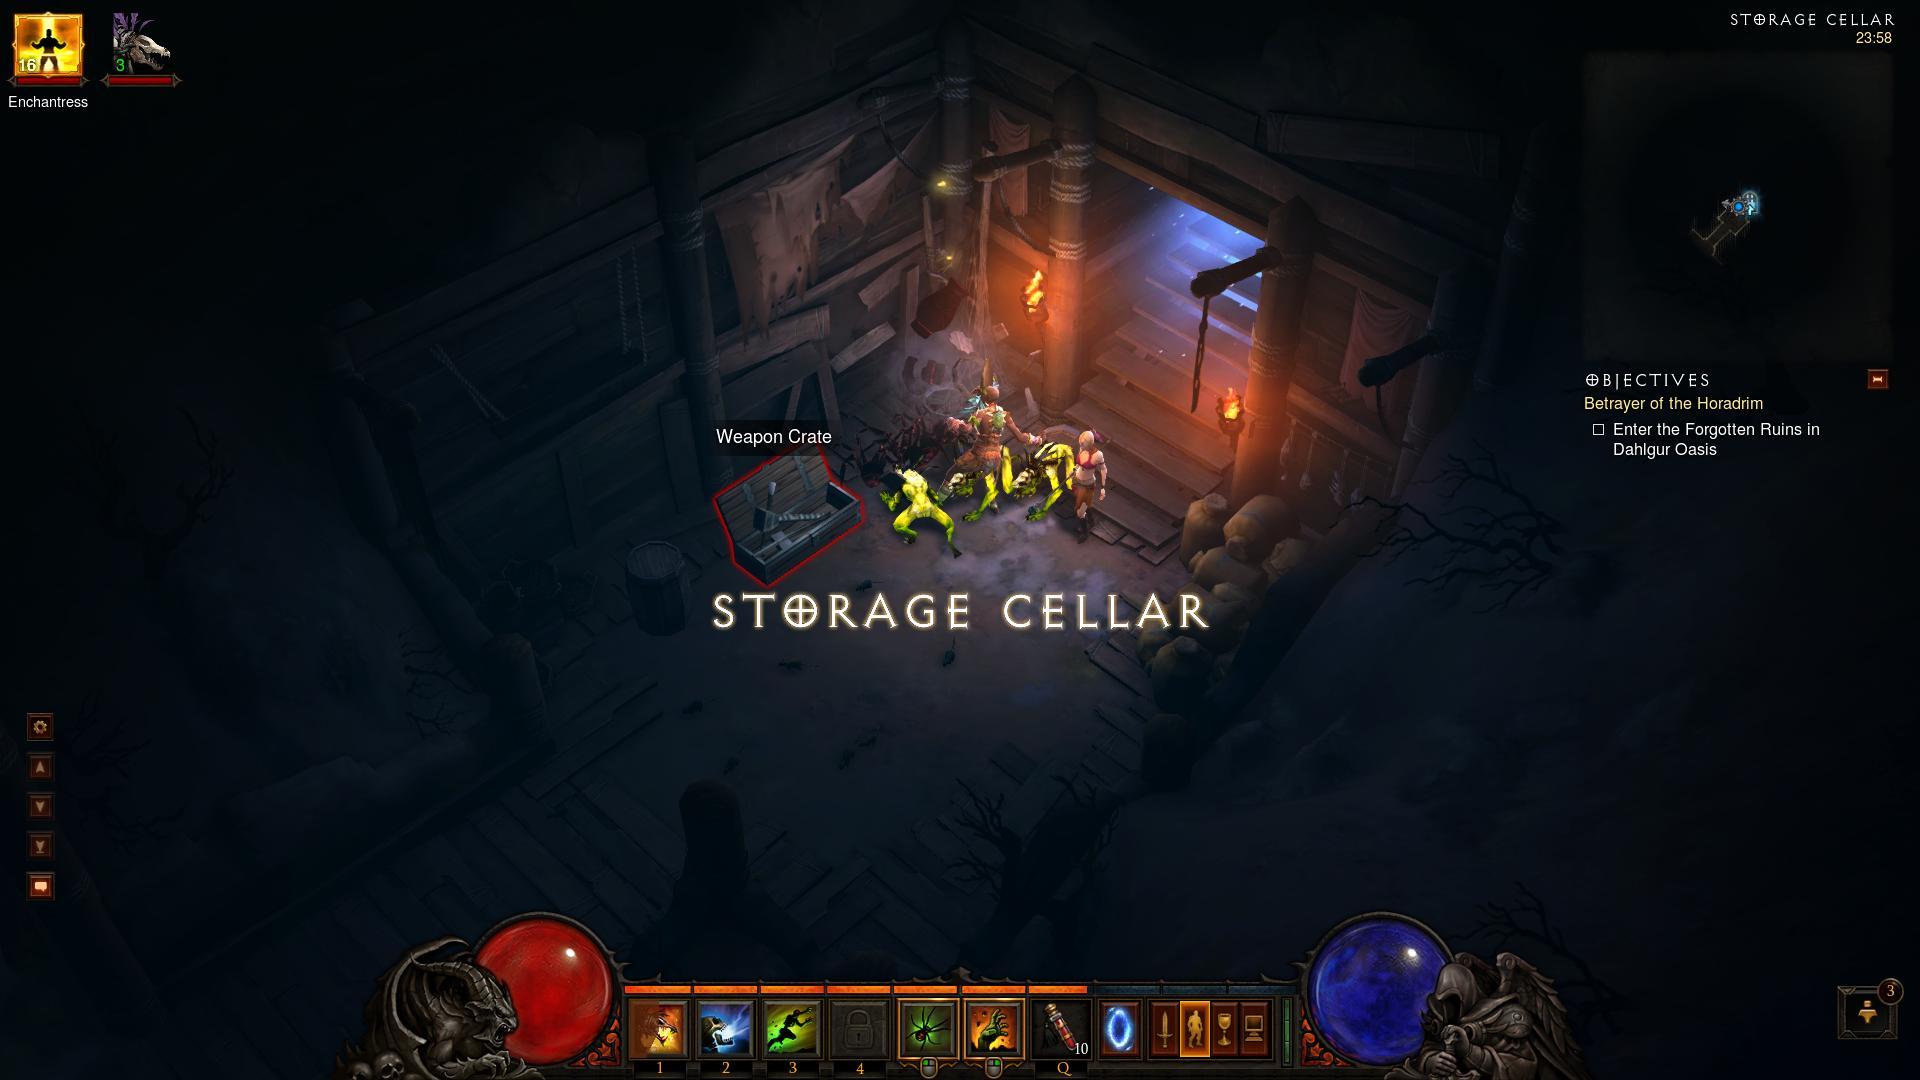 Diablo-3-Storage-Cellar.jpg